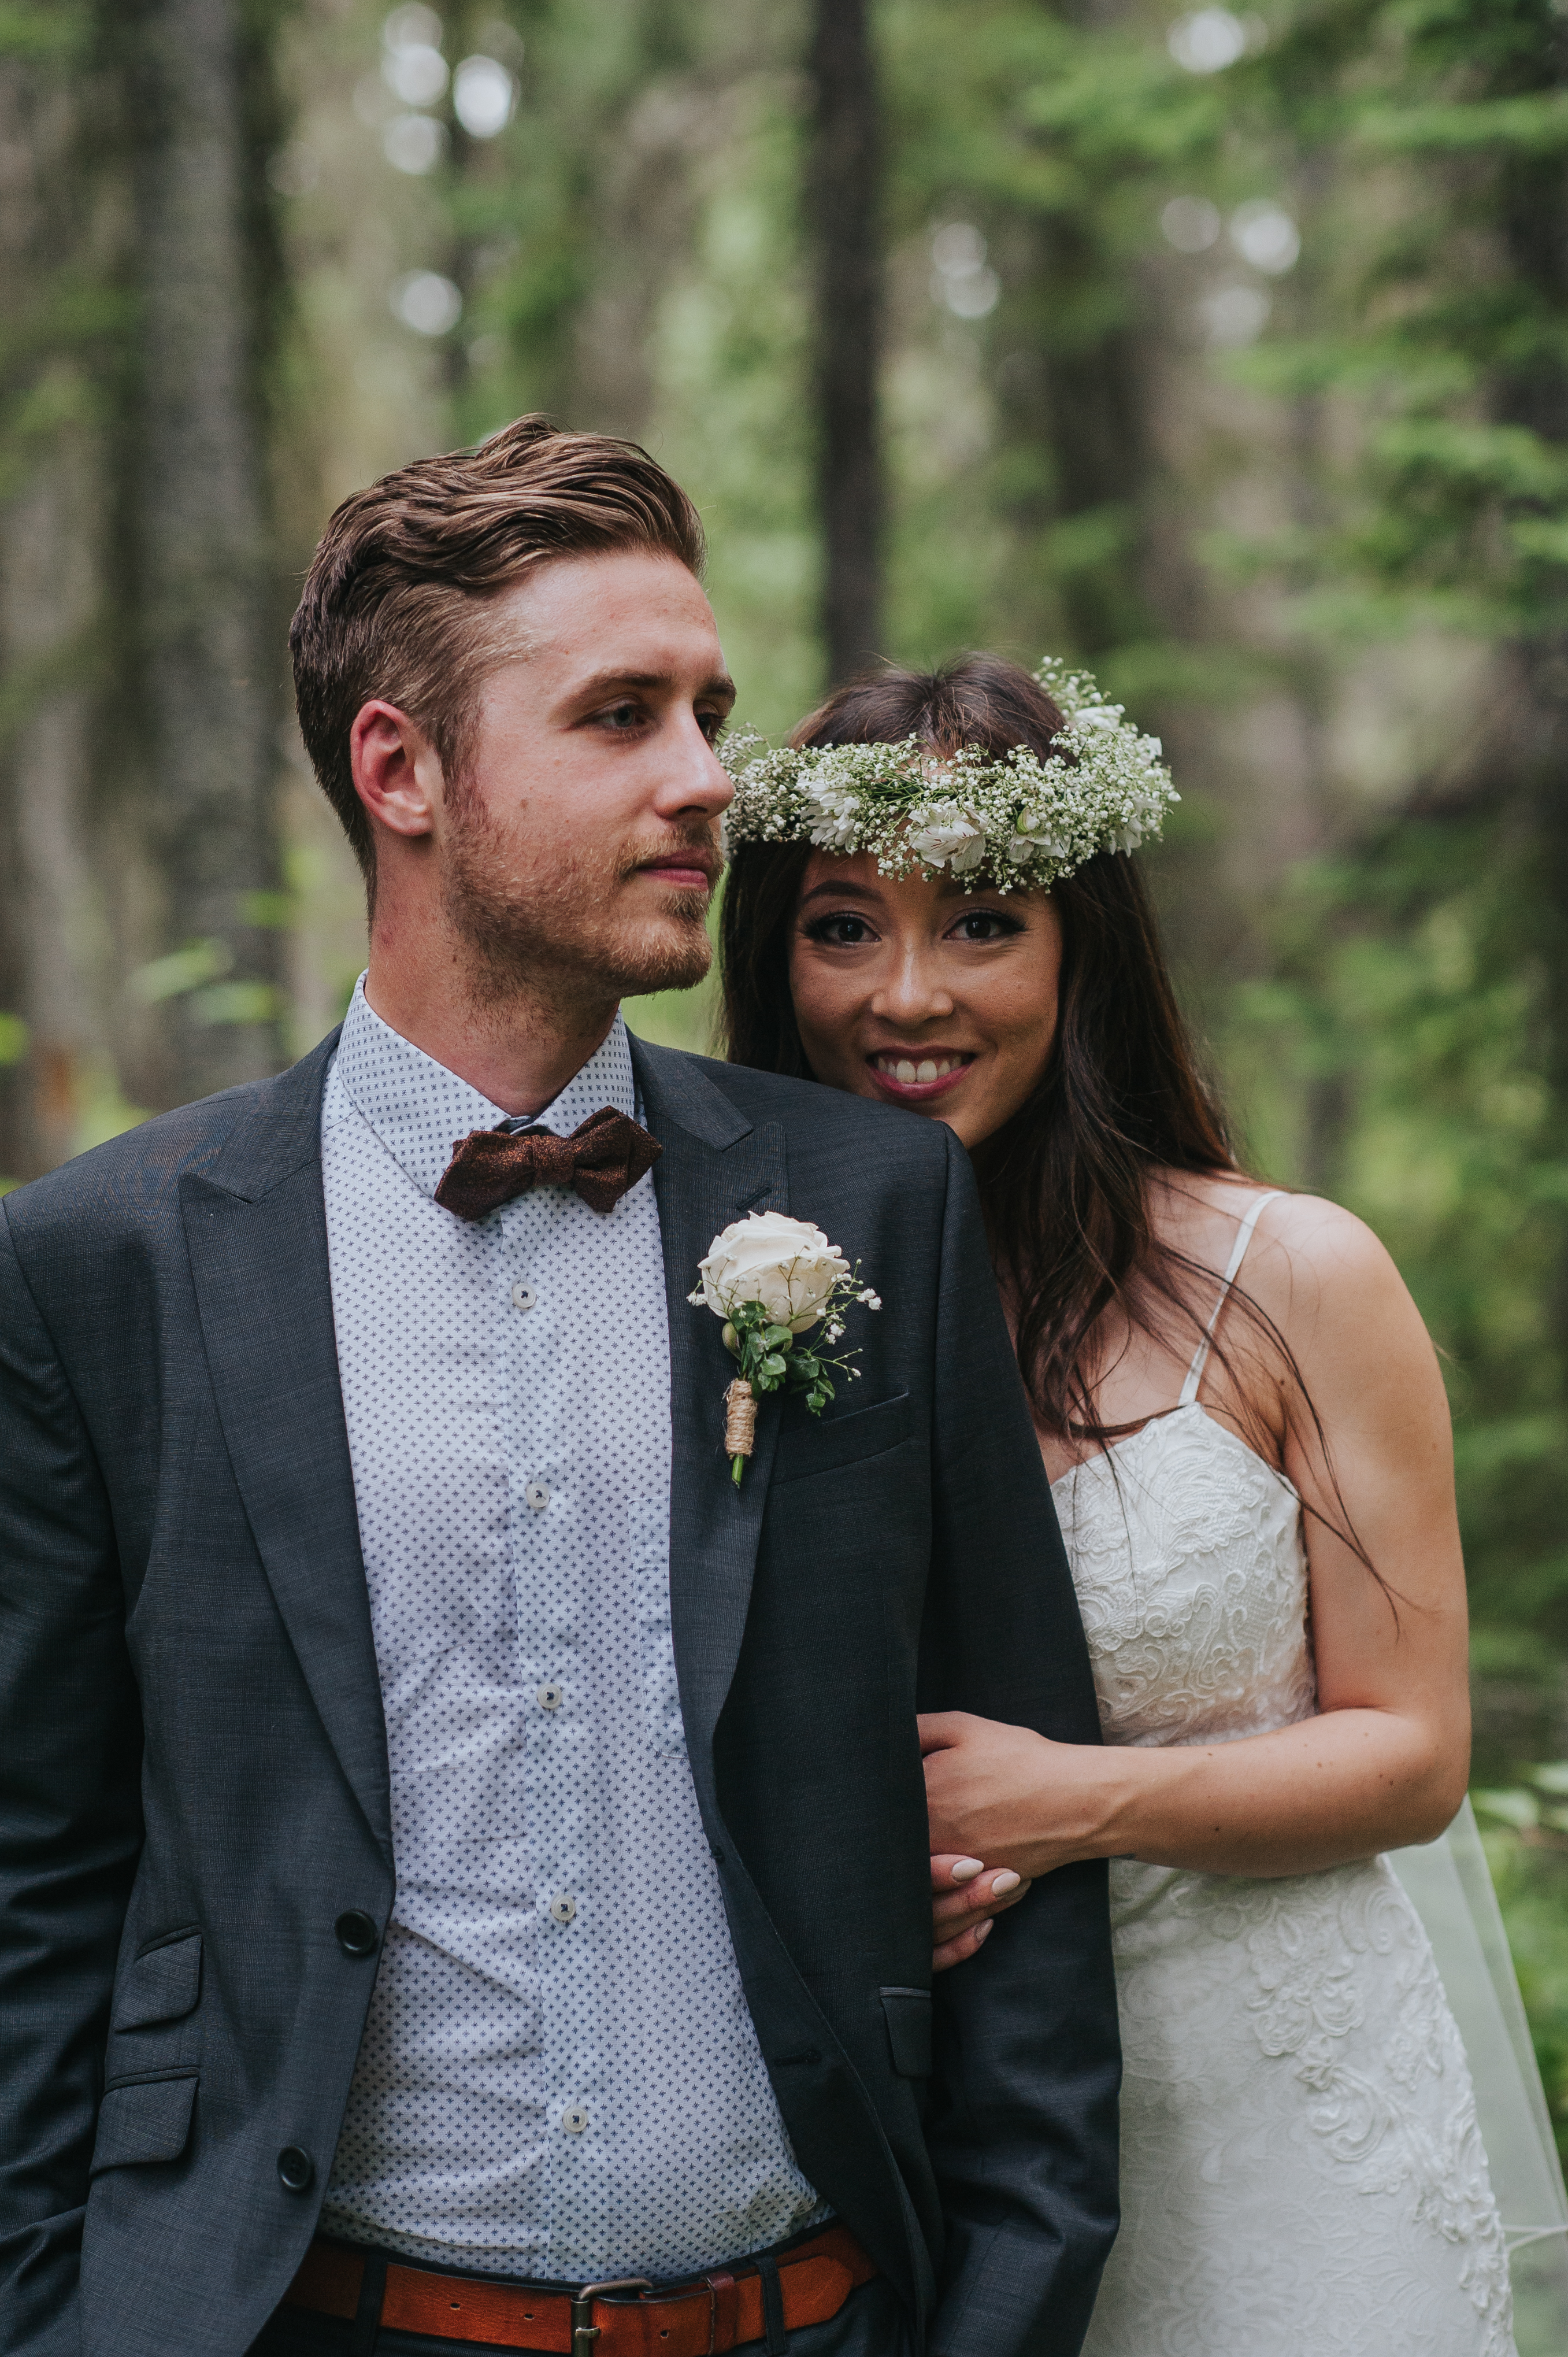 Clymont Community Hall Wedding